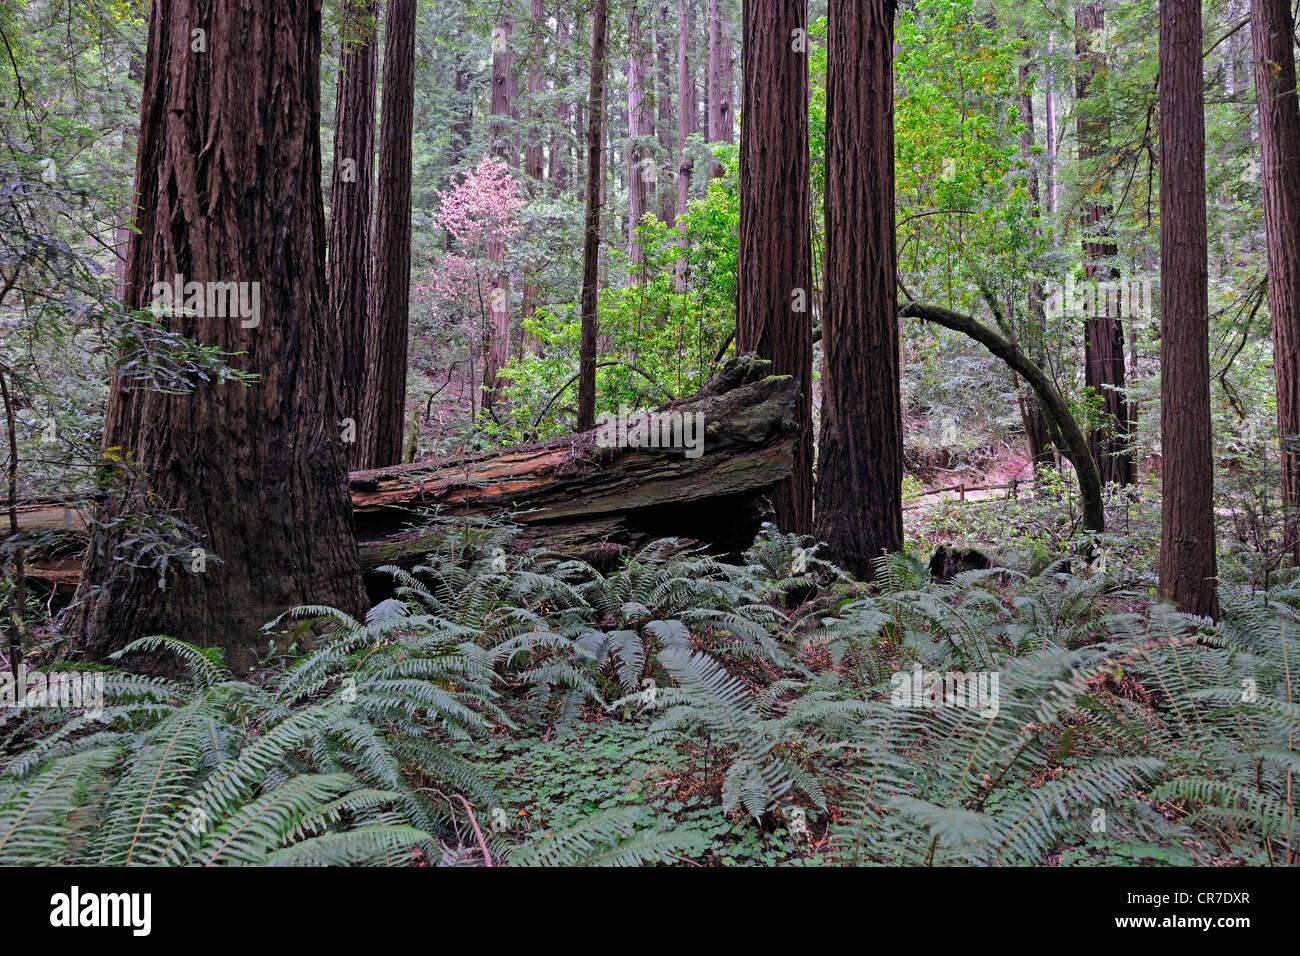 Vegetation and Coast Redwoods (Sequoia sempervirens), Muir Woods National Park, California, USA - Stock Image